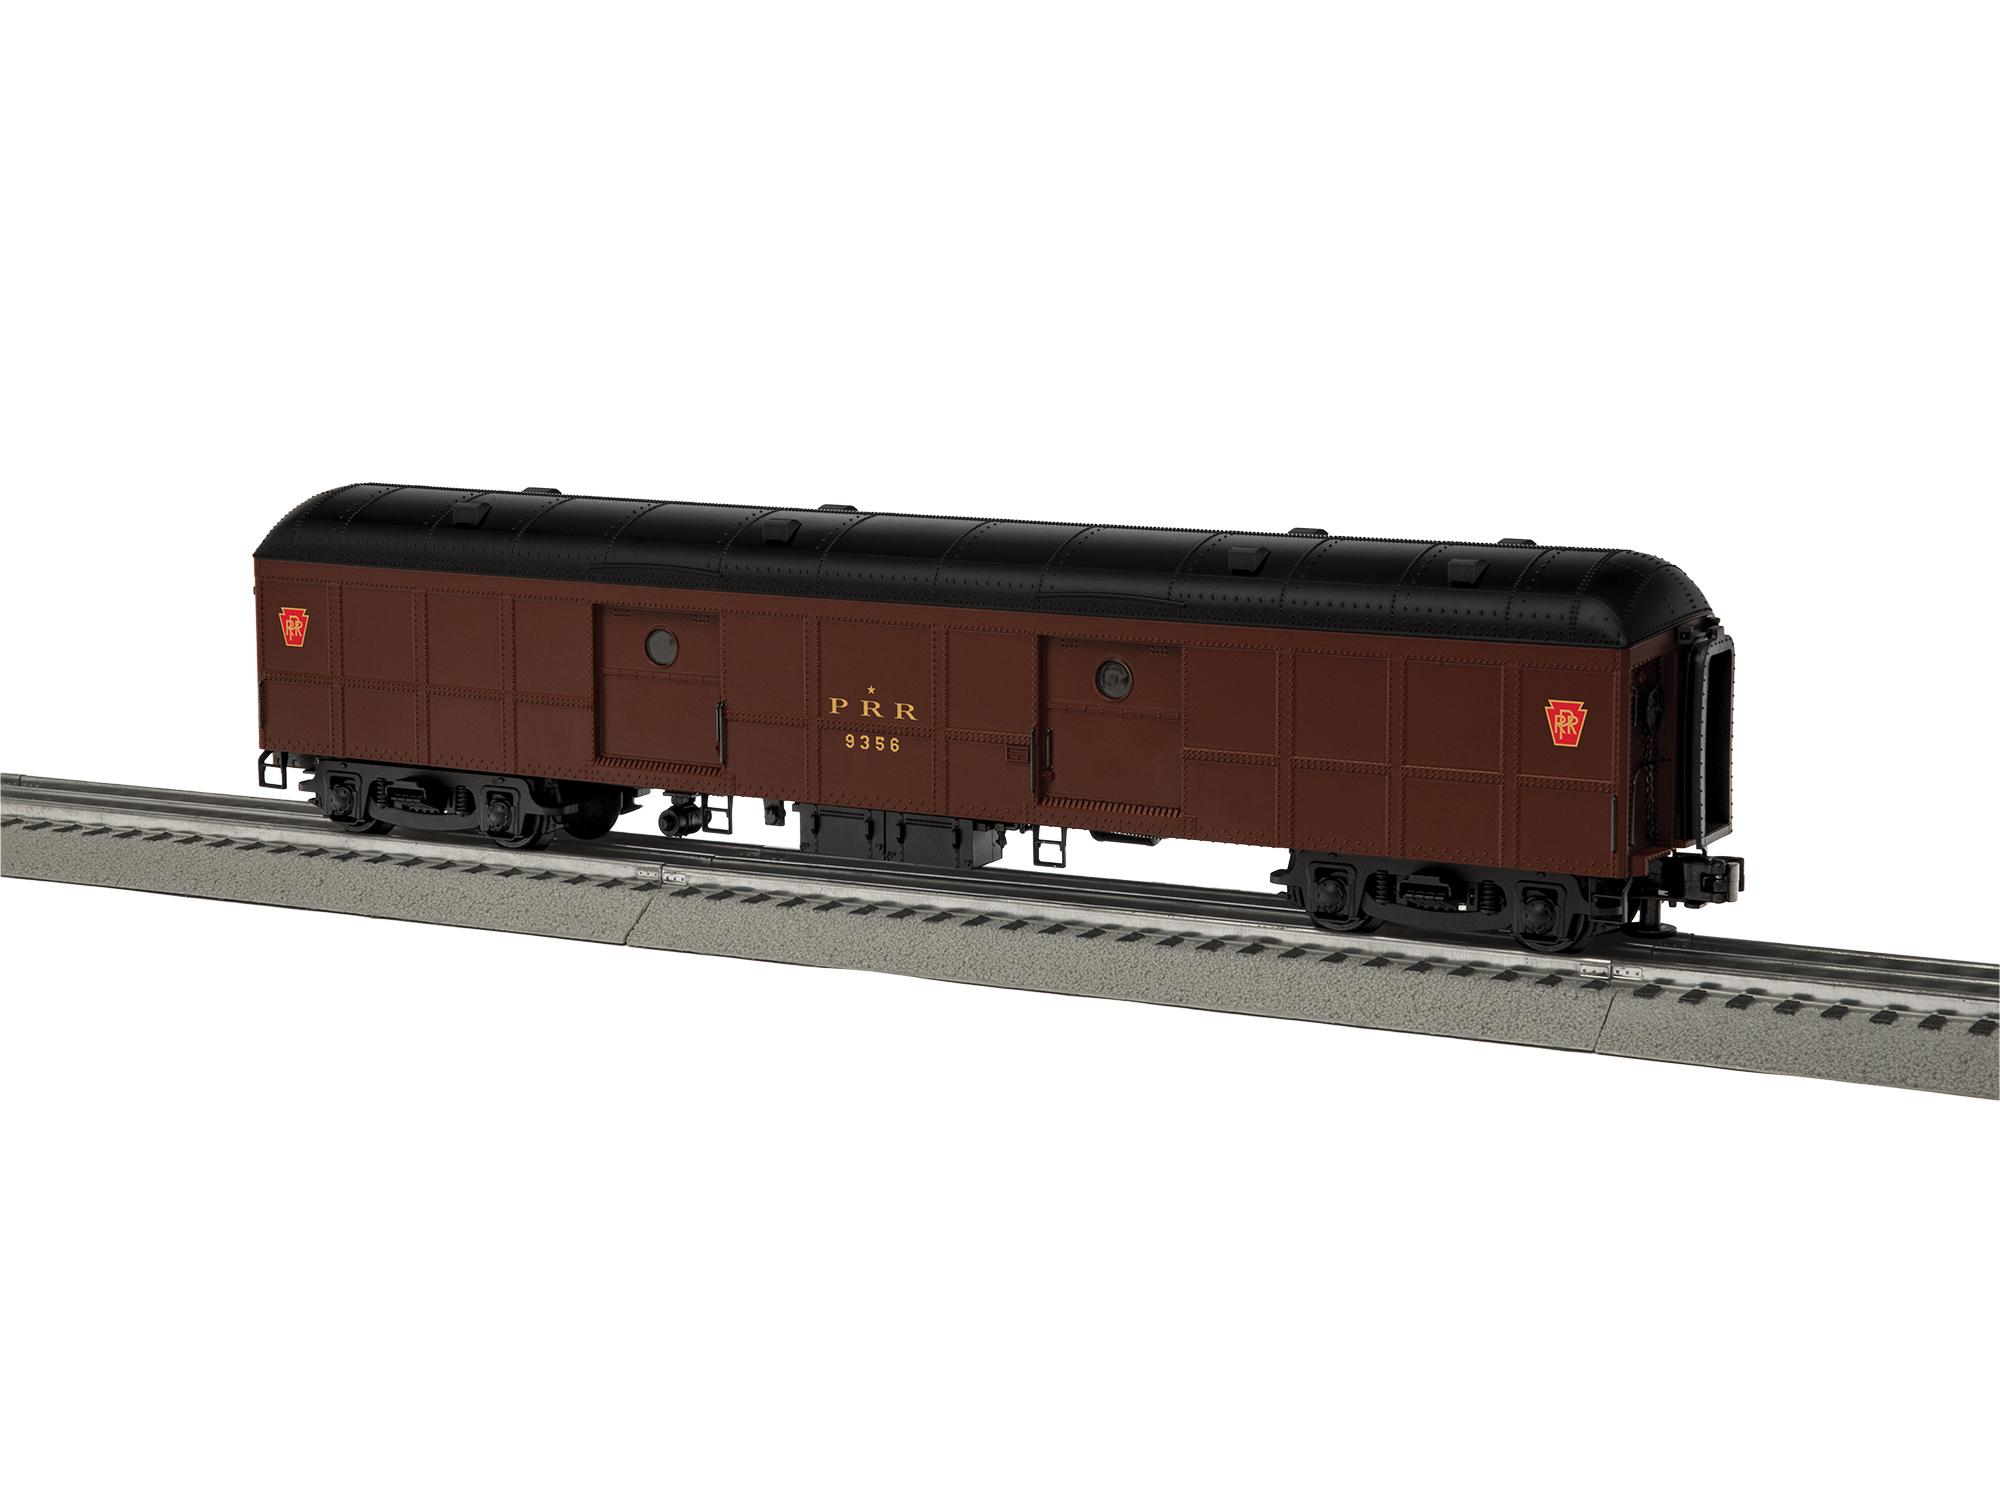 LNL684993 Lionel O B60 Round Roof Baggage/1960, PRR #9356